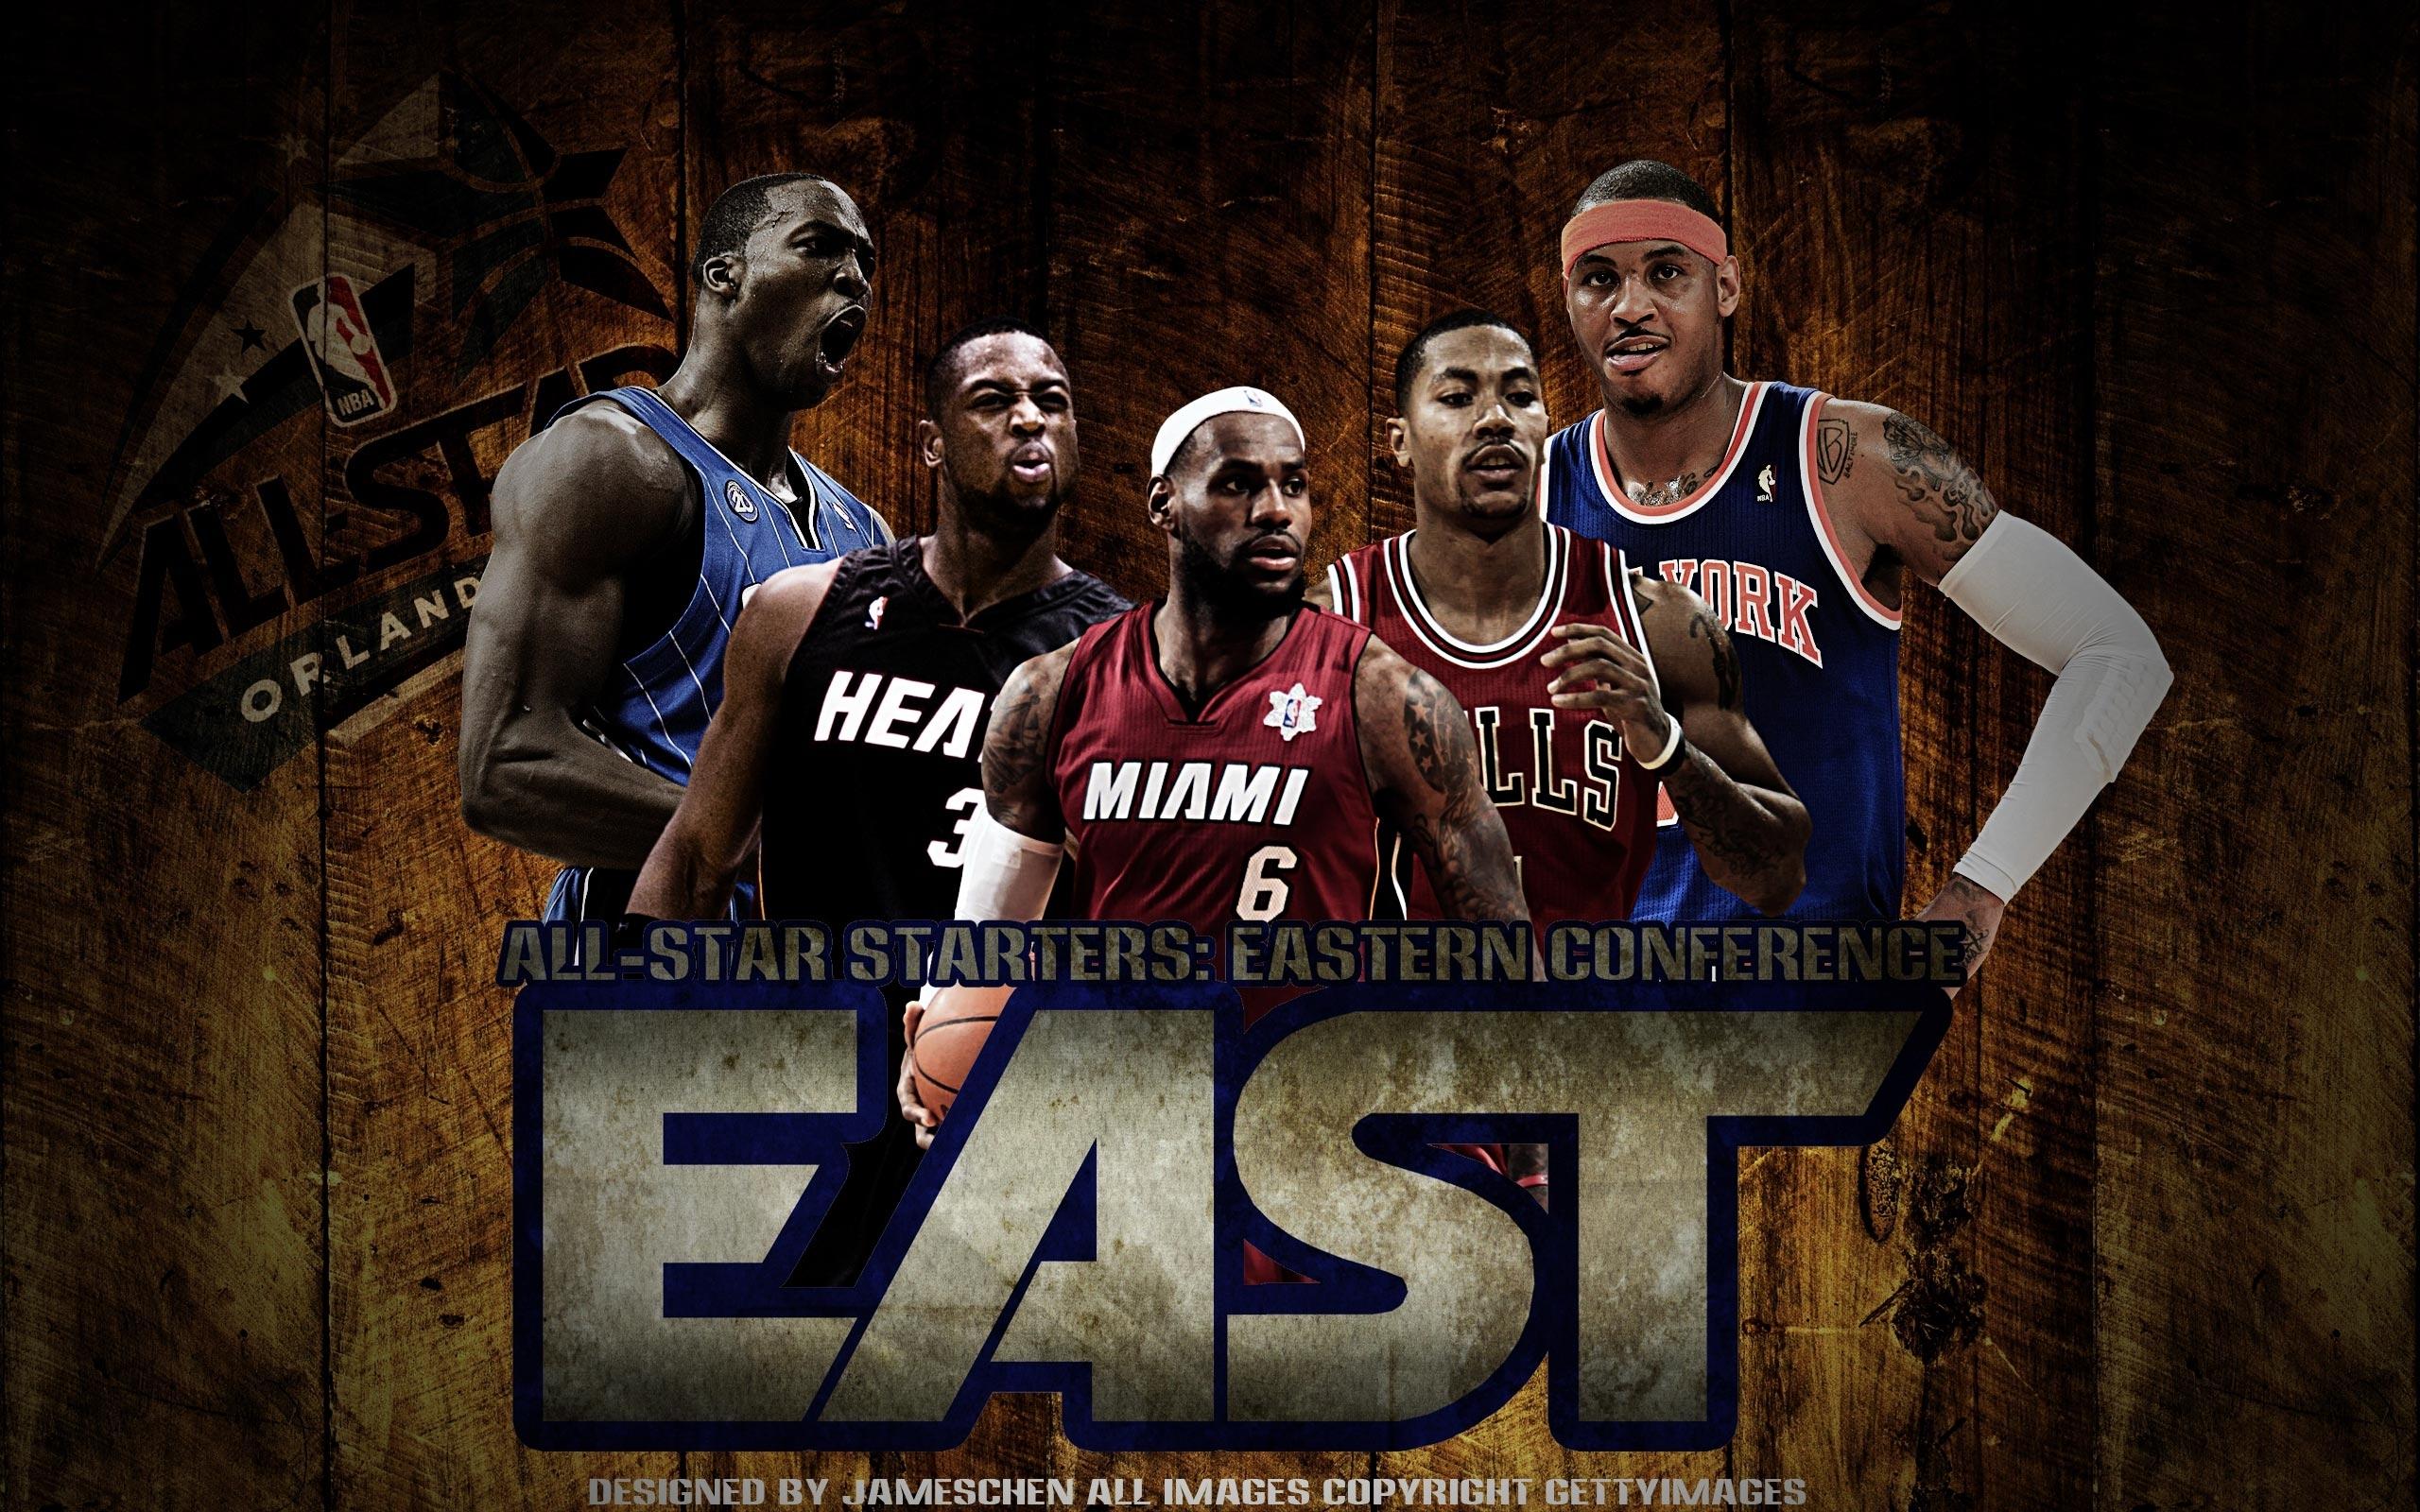 2012 nba all-star east starters 2560×1600 wallpaper | basketball